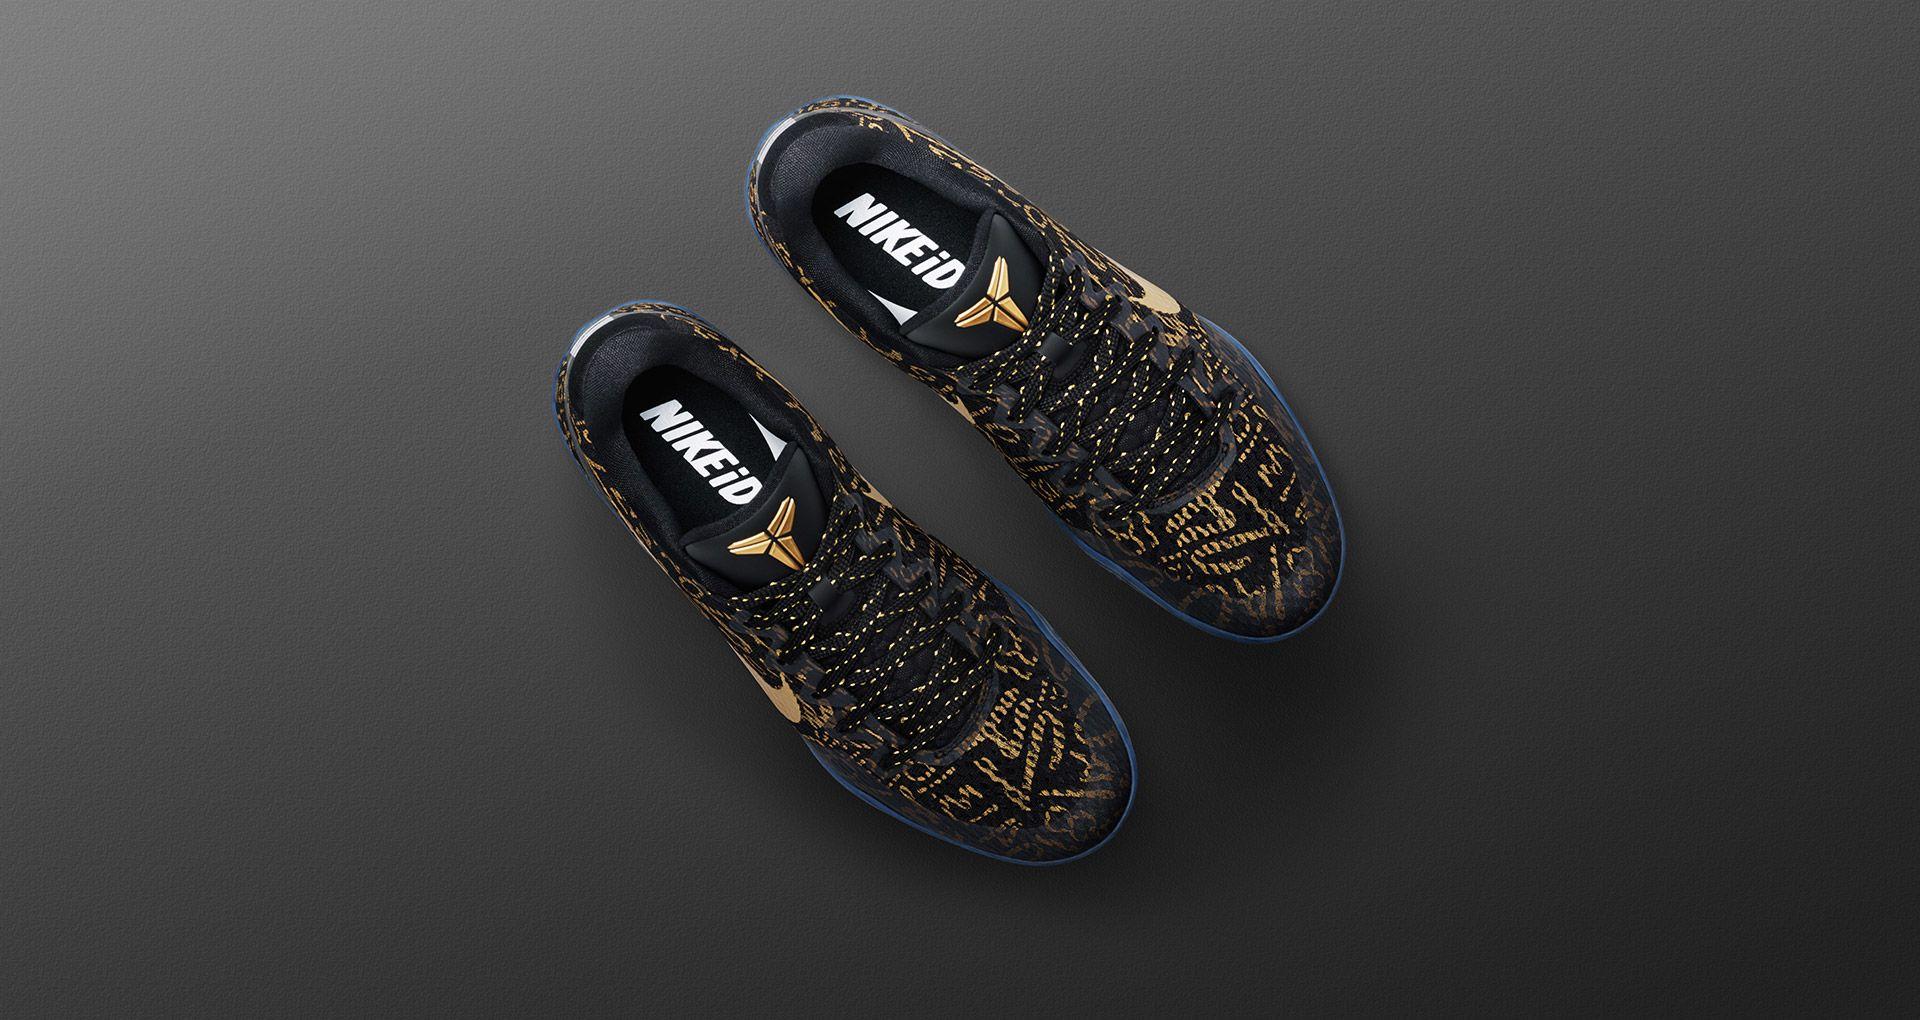 new concept d1976 419ec Nike Kobe 11 Mamba Day iD Release Date